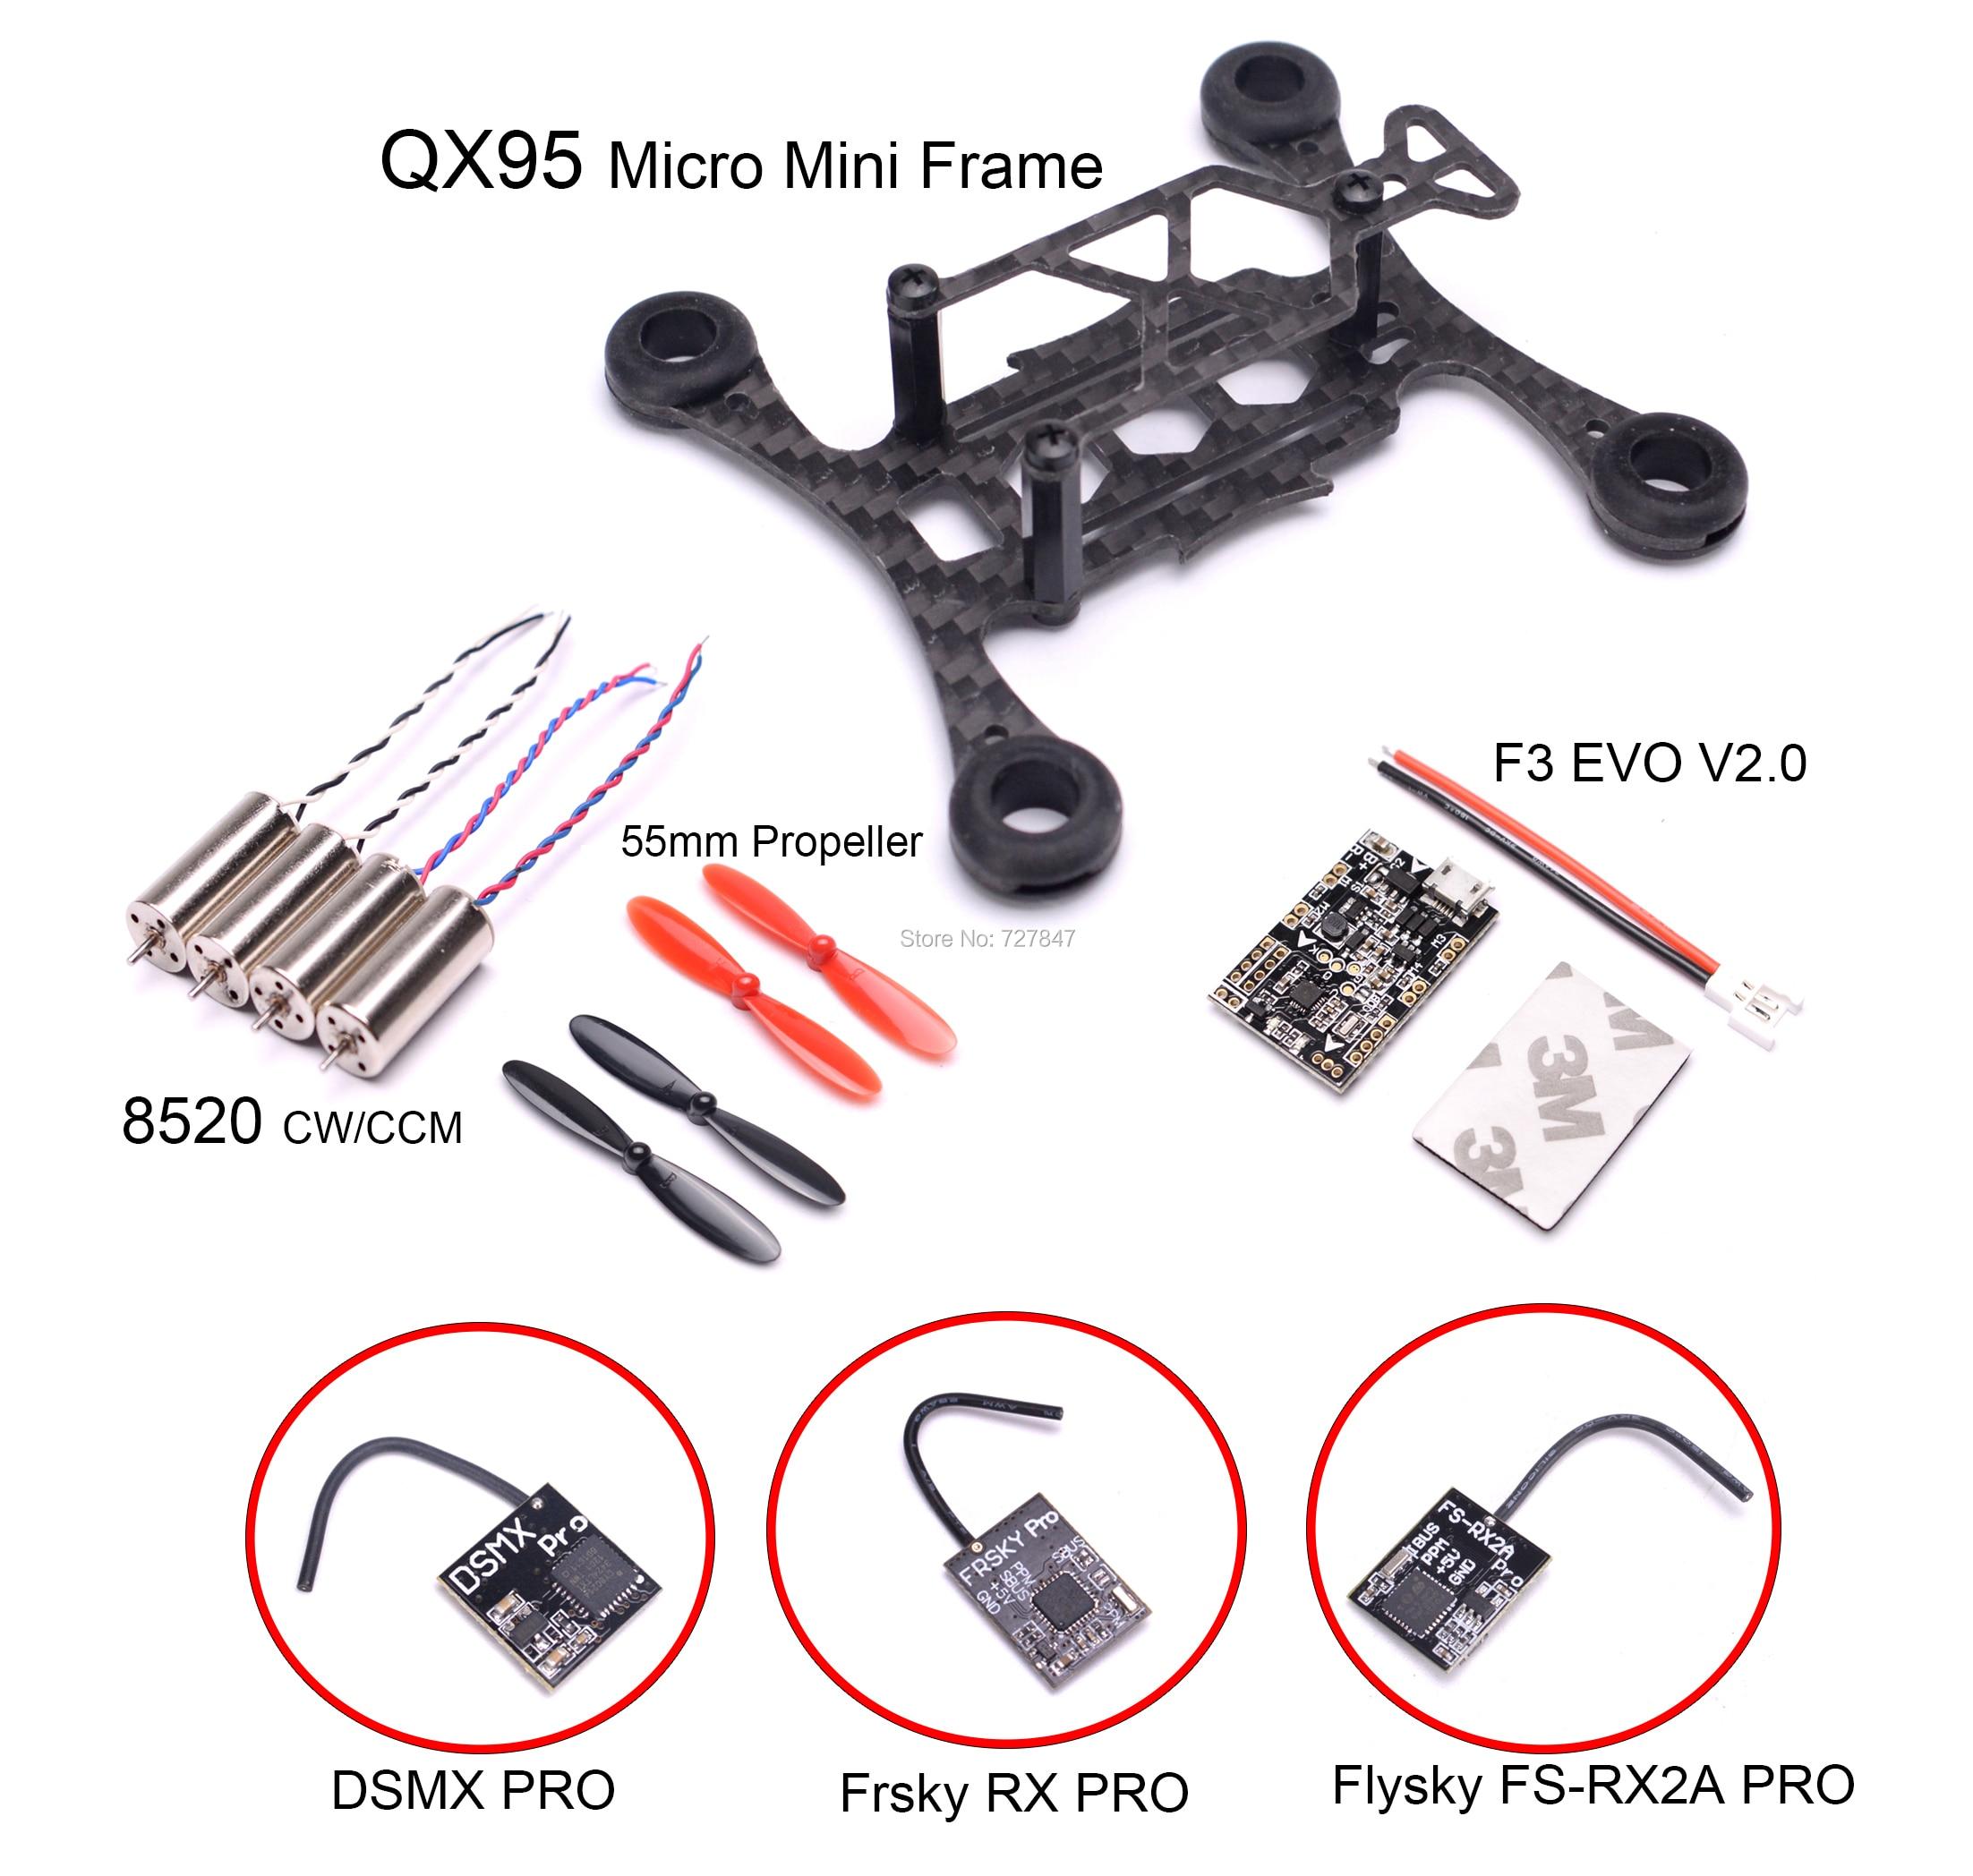 Micro Mini QX95 95mm Frame FPV RC Carbon Fiber 8520 Coreless Motor F3 EVO V2.0 Brush Flight Control 55mm Prop Frsky RX Receiver